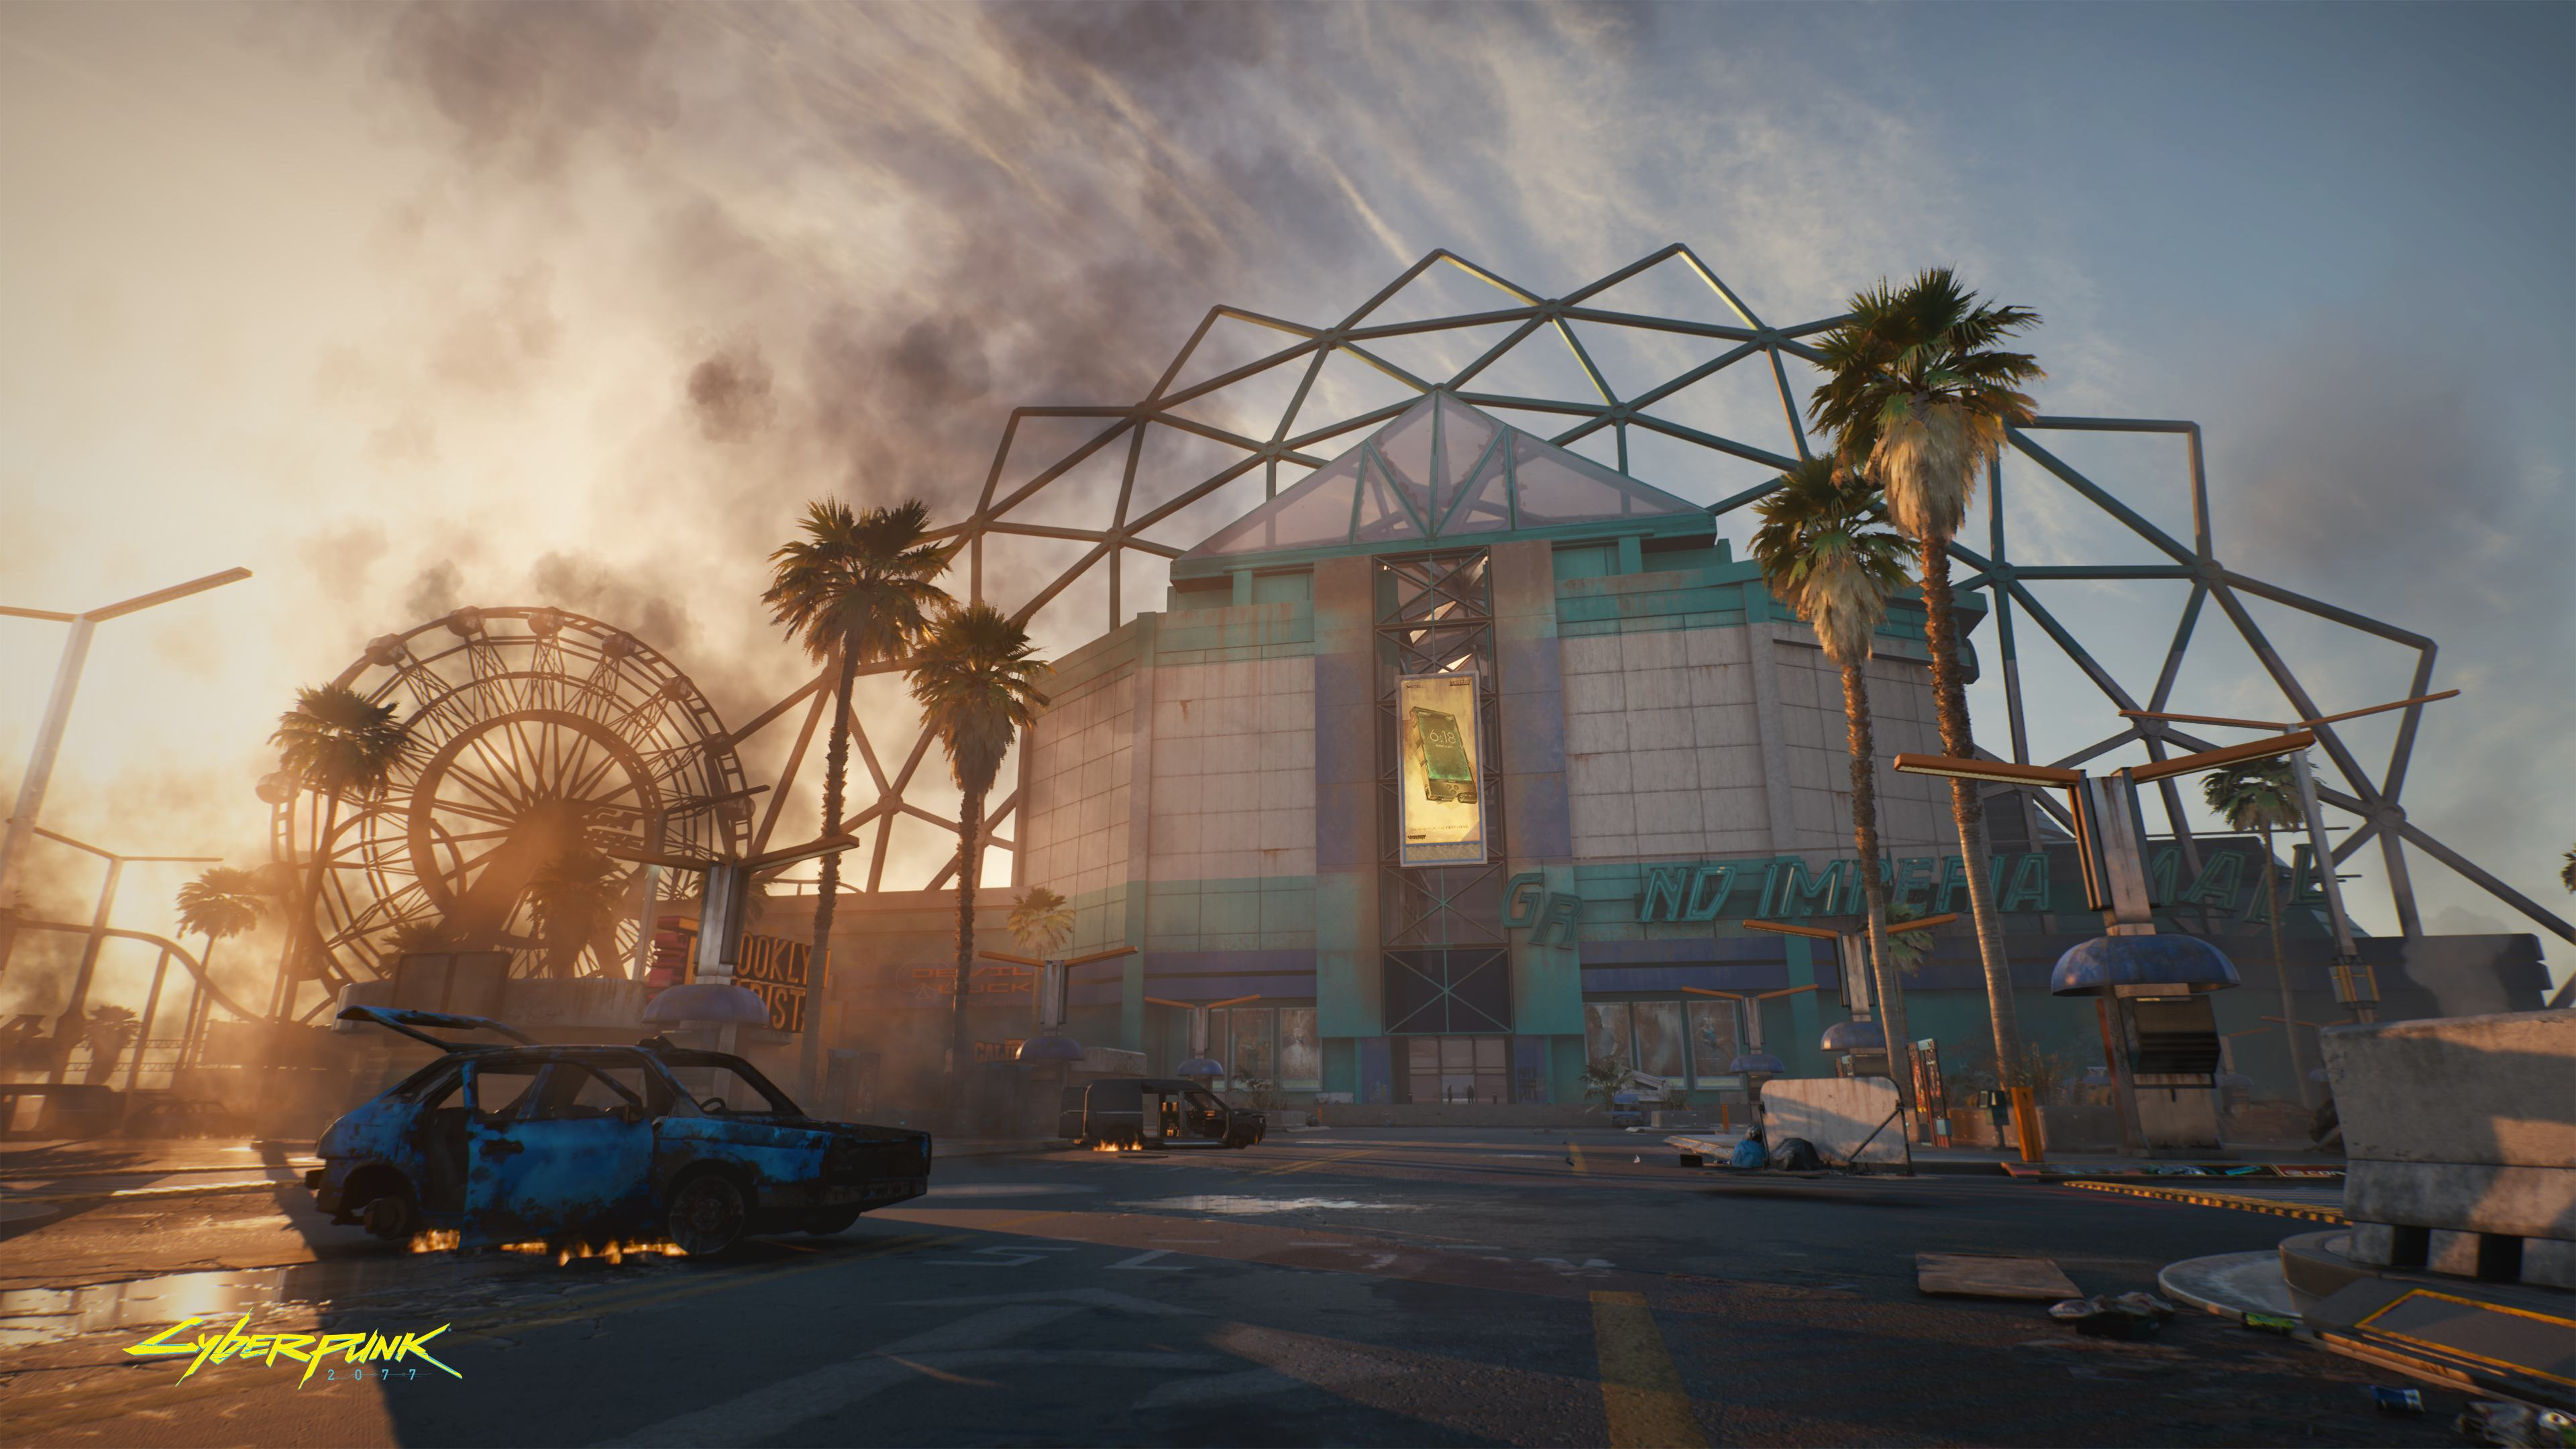 cyberpunk-2077-gamescom-2019-building